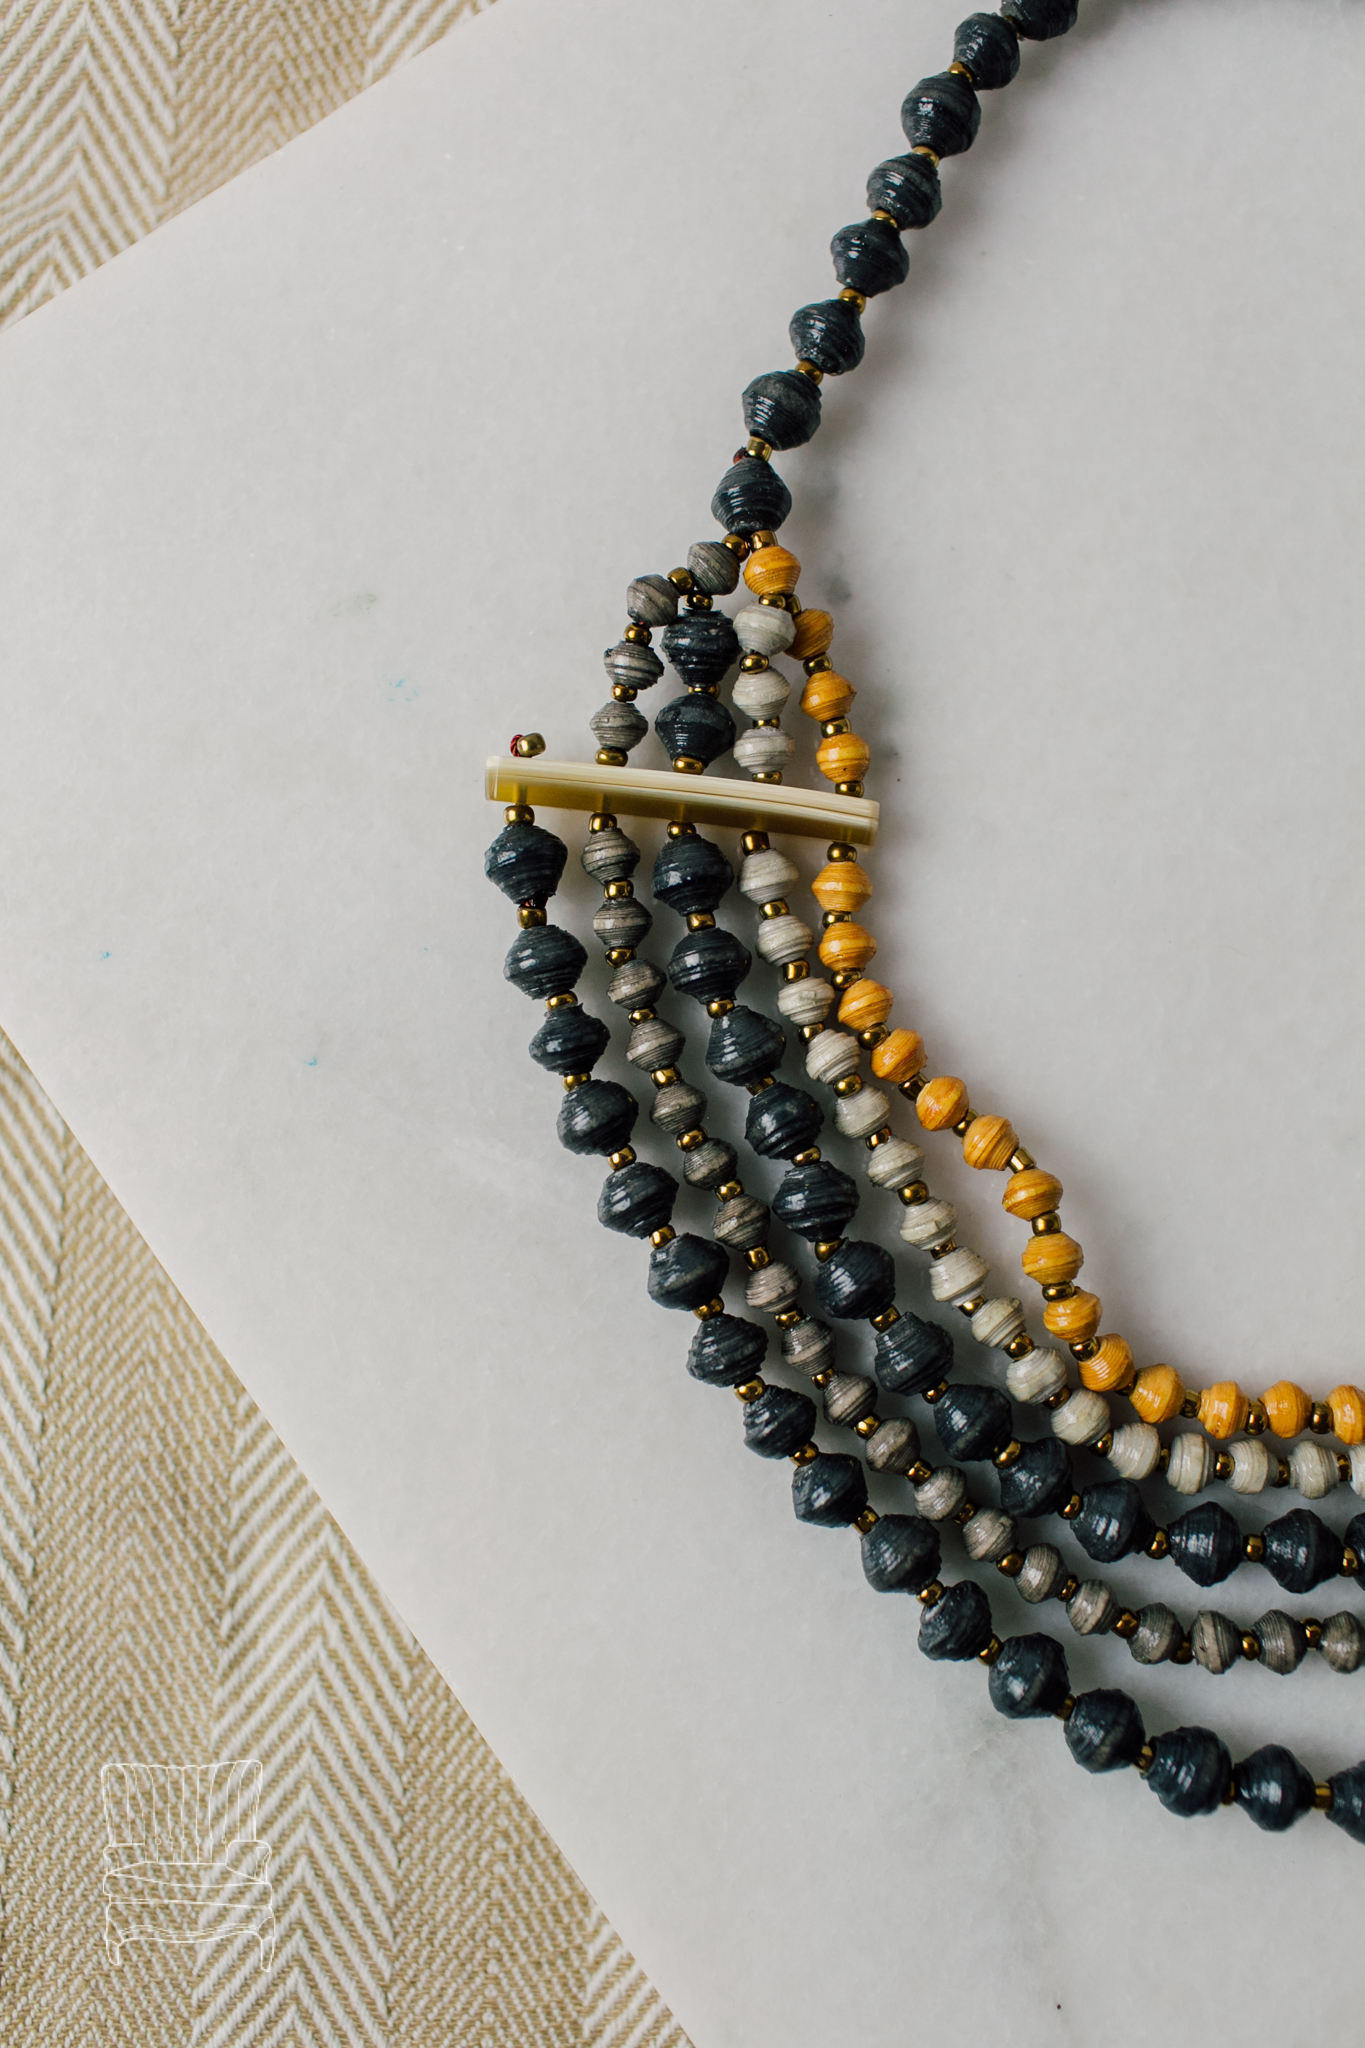 ajuna-jewelry-marketing-photographer-katheryn-moran-fall-2017-7.jpg